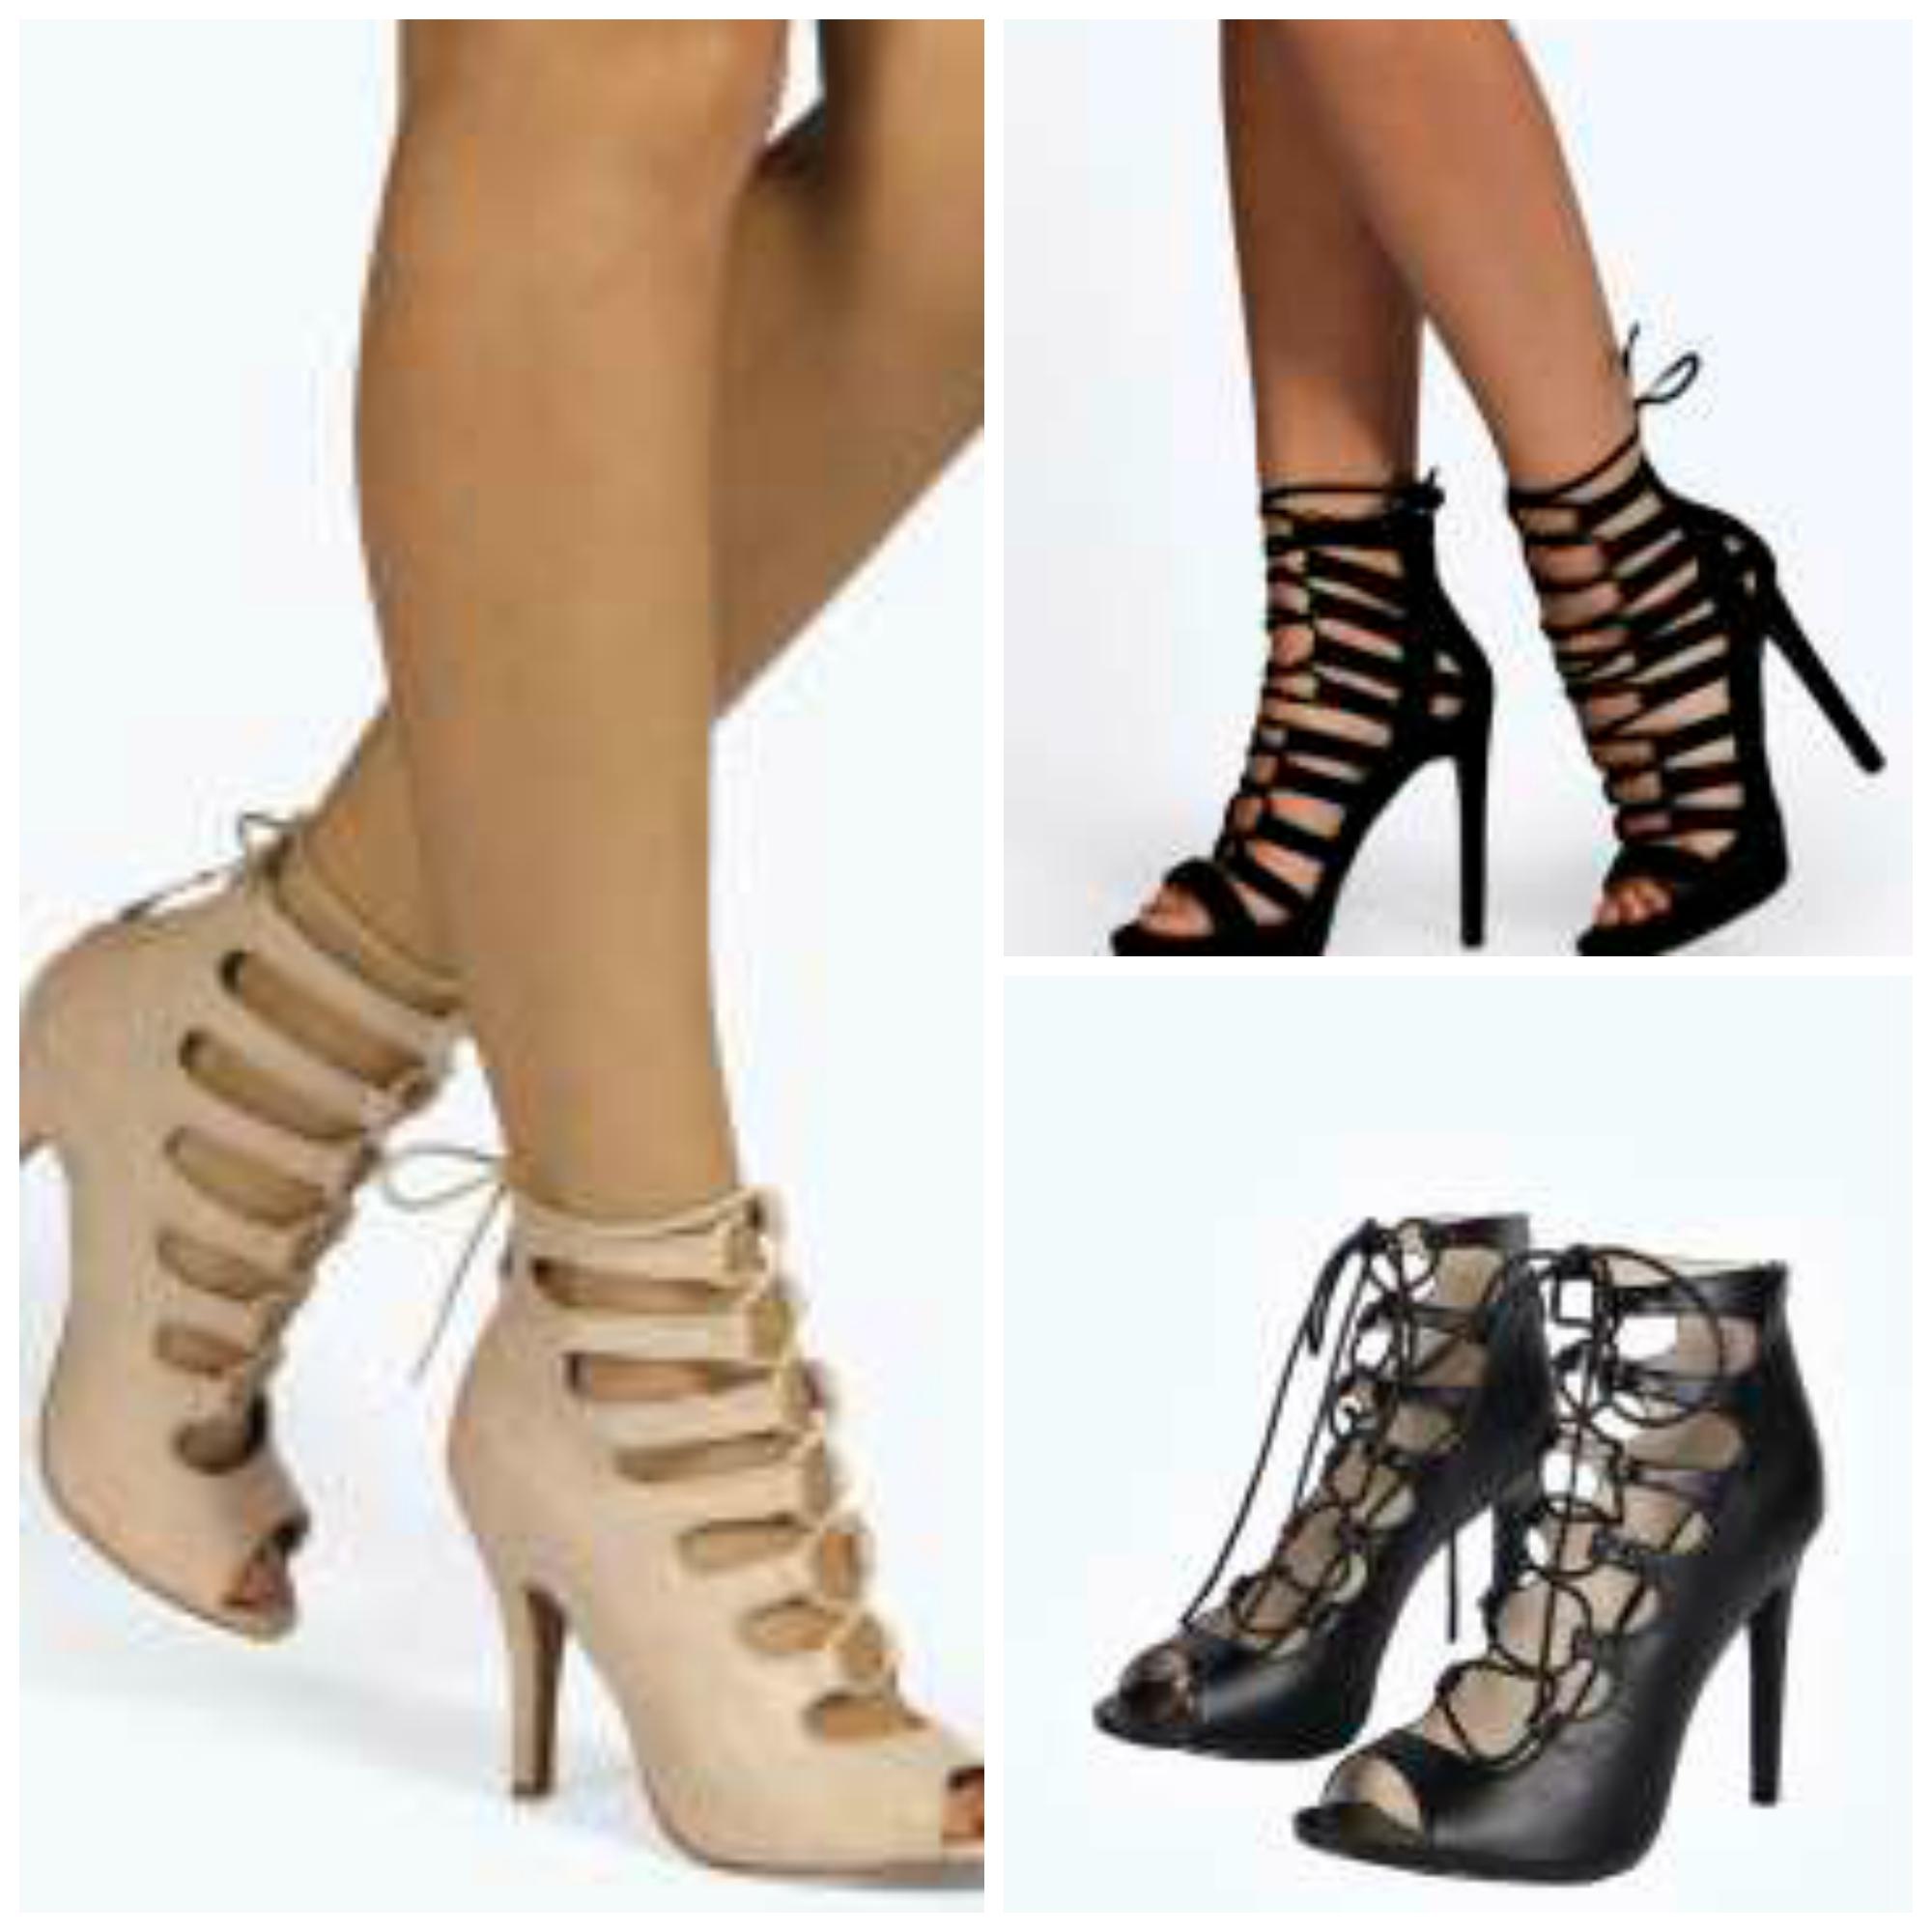 e4eb435ede5 Lace Heels: Lace Up Heels Tumblr